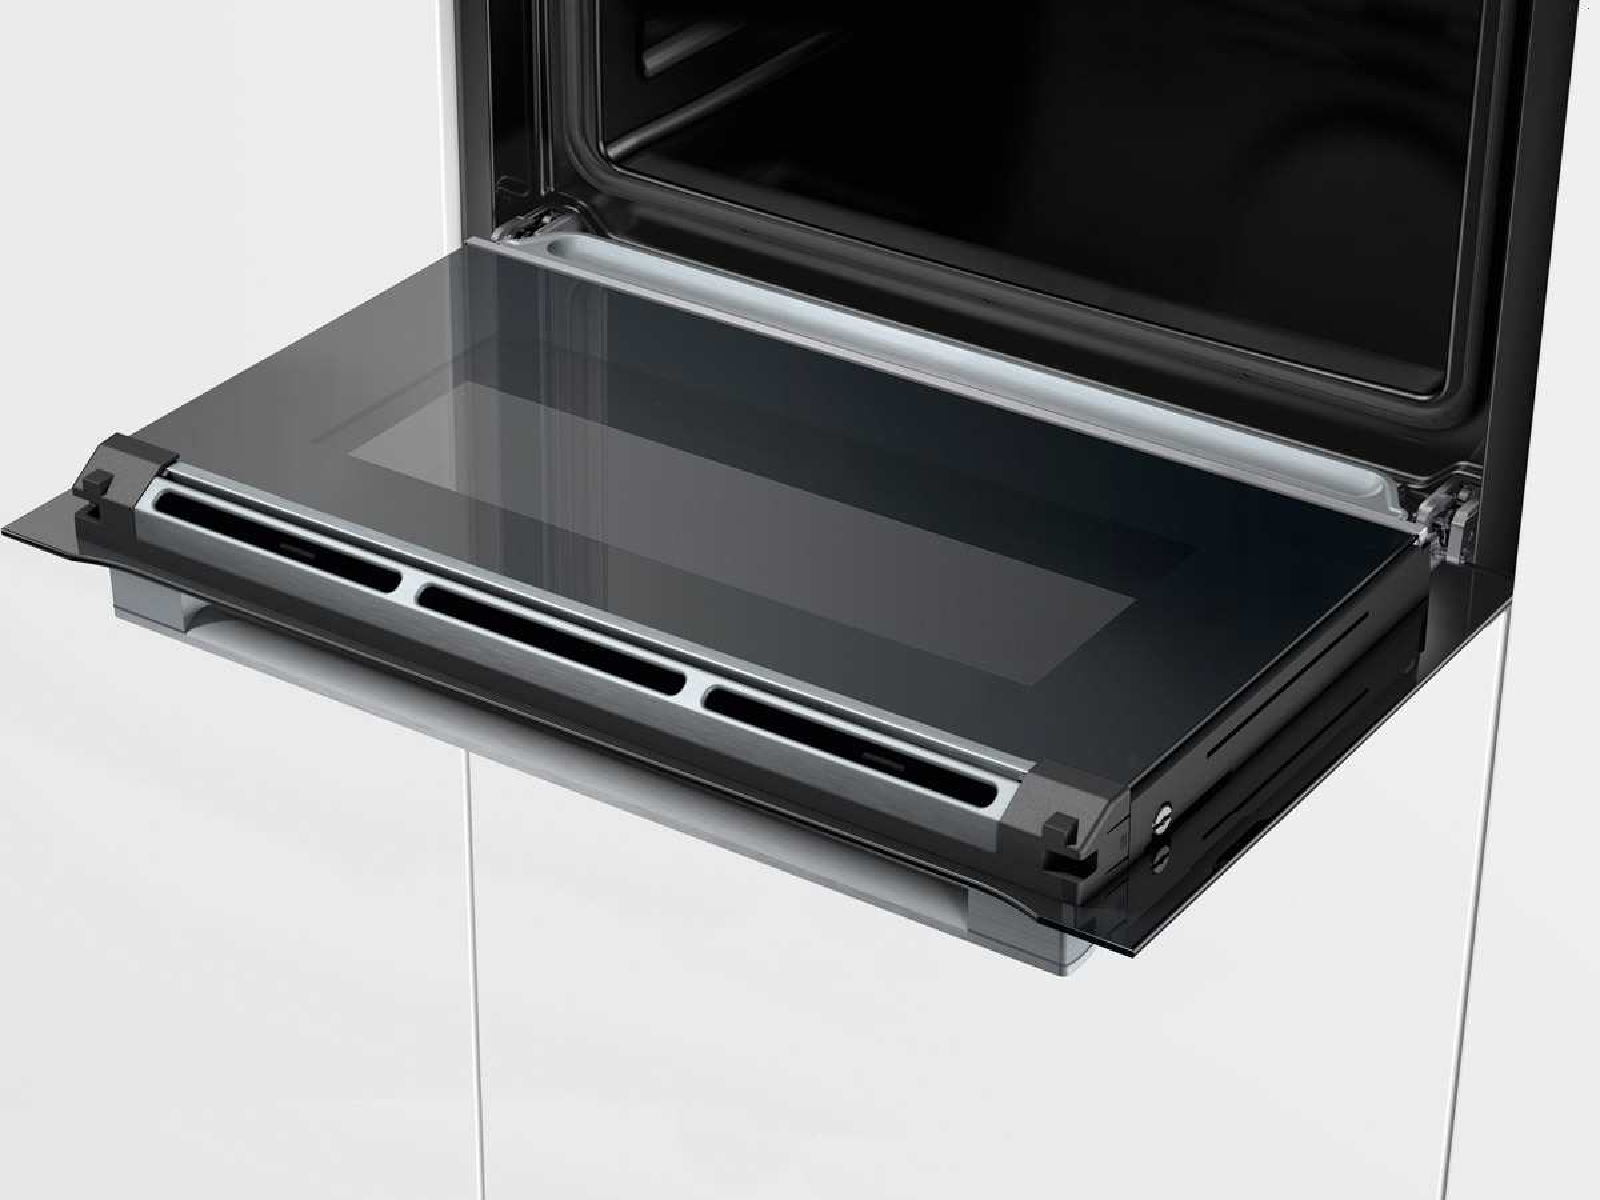 bosch csg636bs2 kompakt dampfgar backofen edelstahl dampfpofen einbau dampf ofen. Black Bedroom Furniture Sets. Home Design Ideas